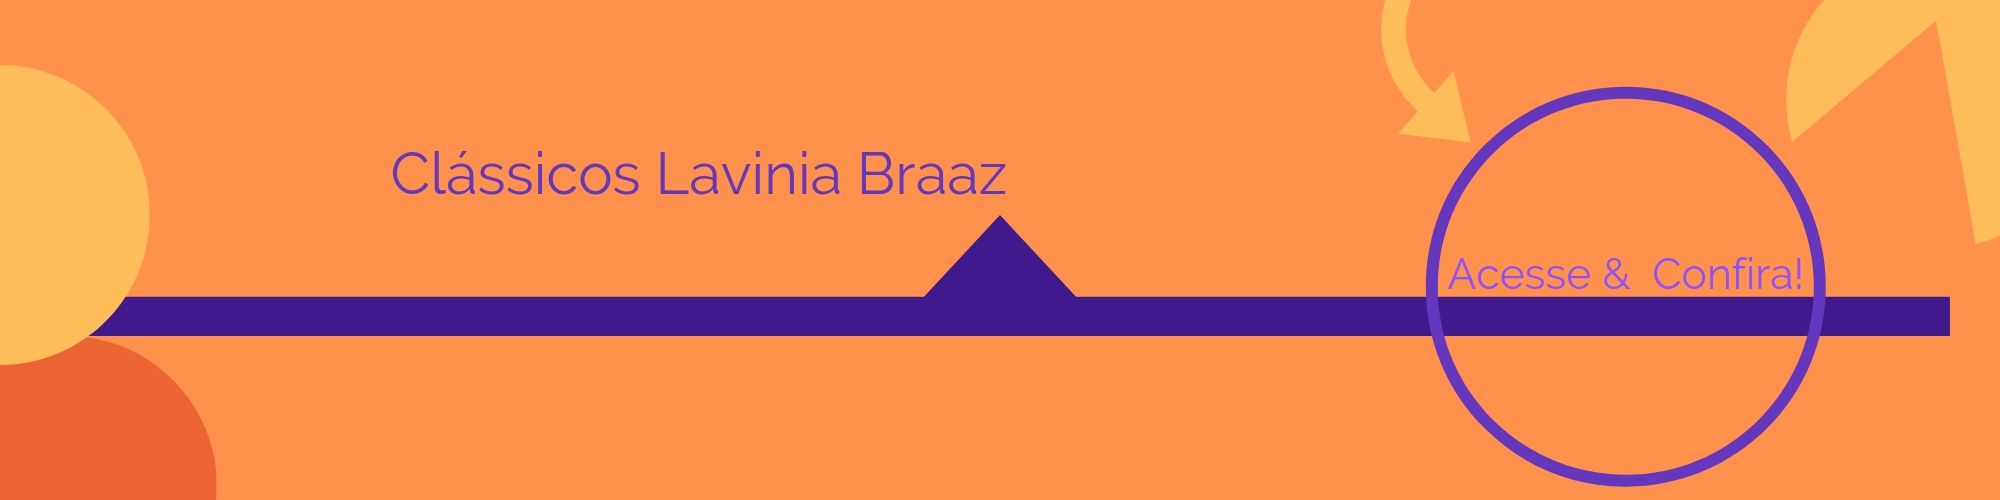 Clássicos Lavinia Braaz